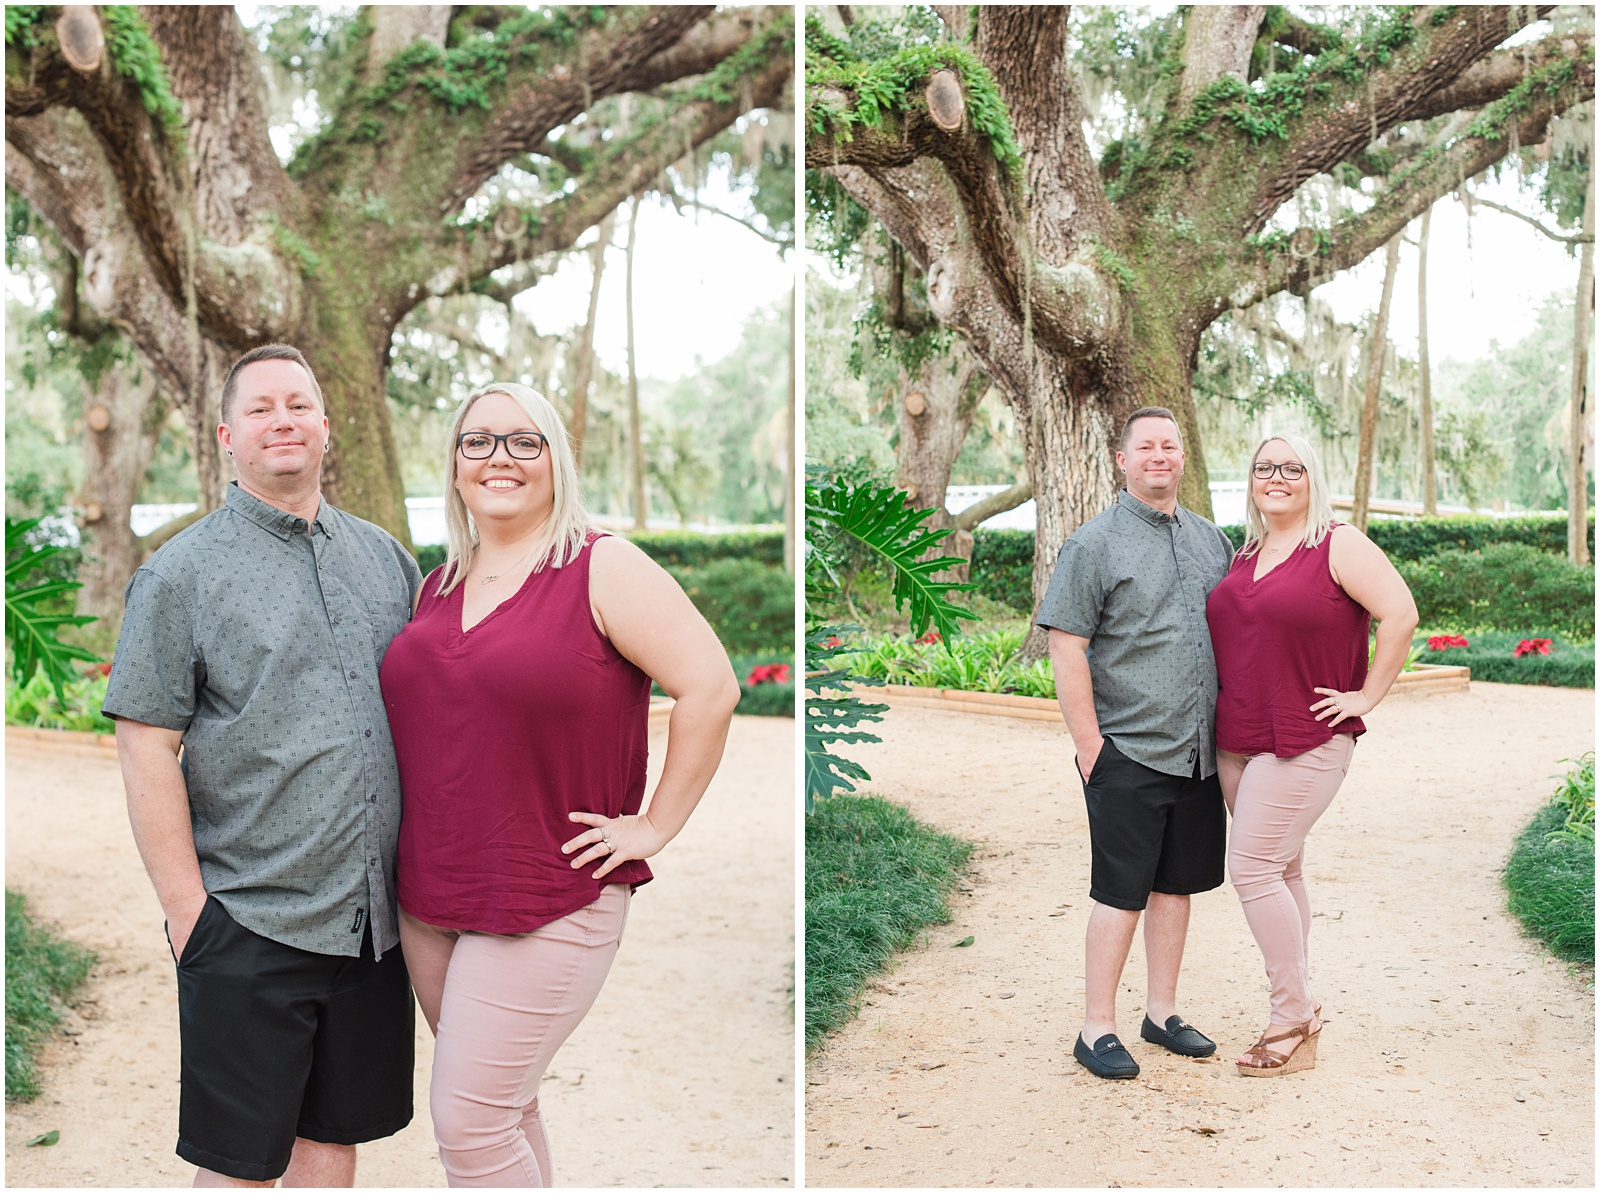 Washington Oaks_Garden_State Park_Beach_Family_Portraits_6.jpg